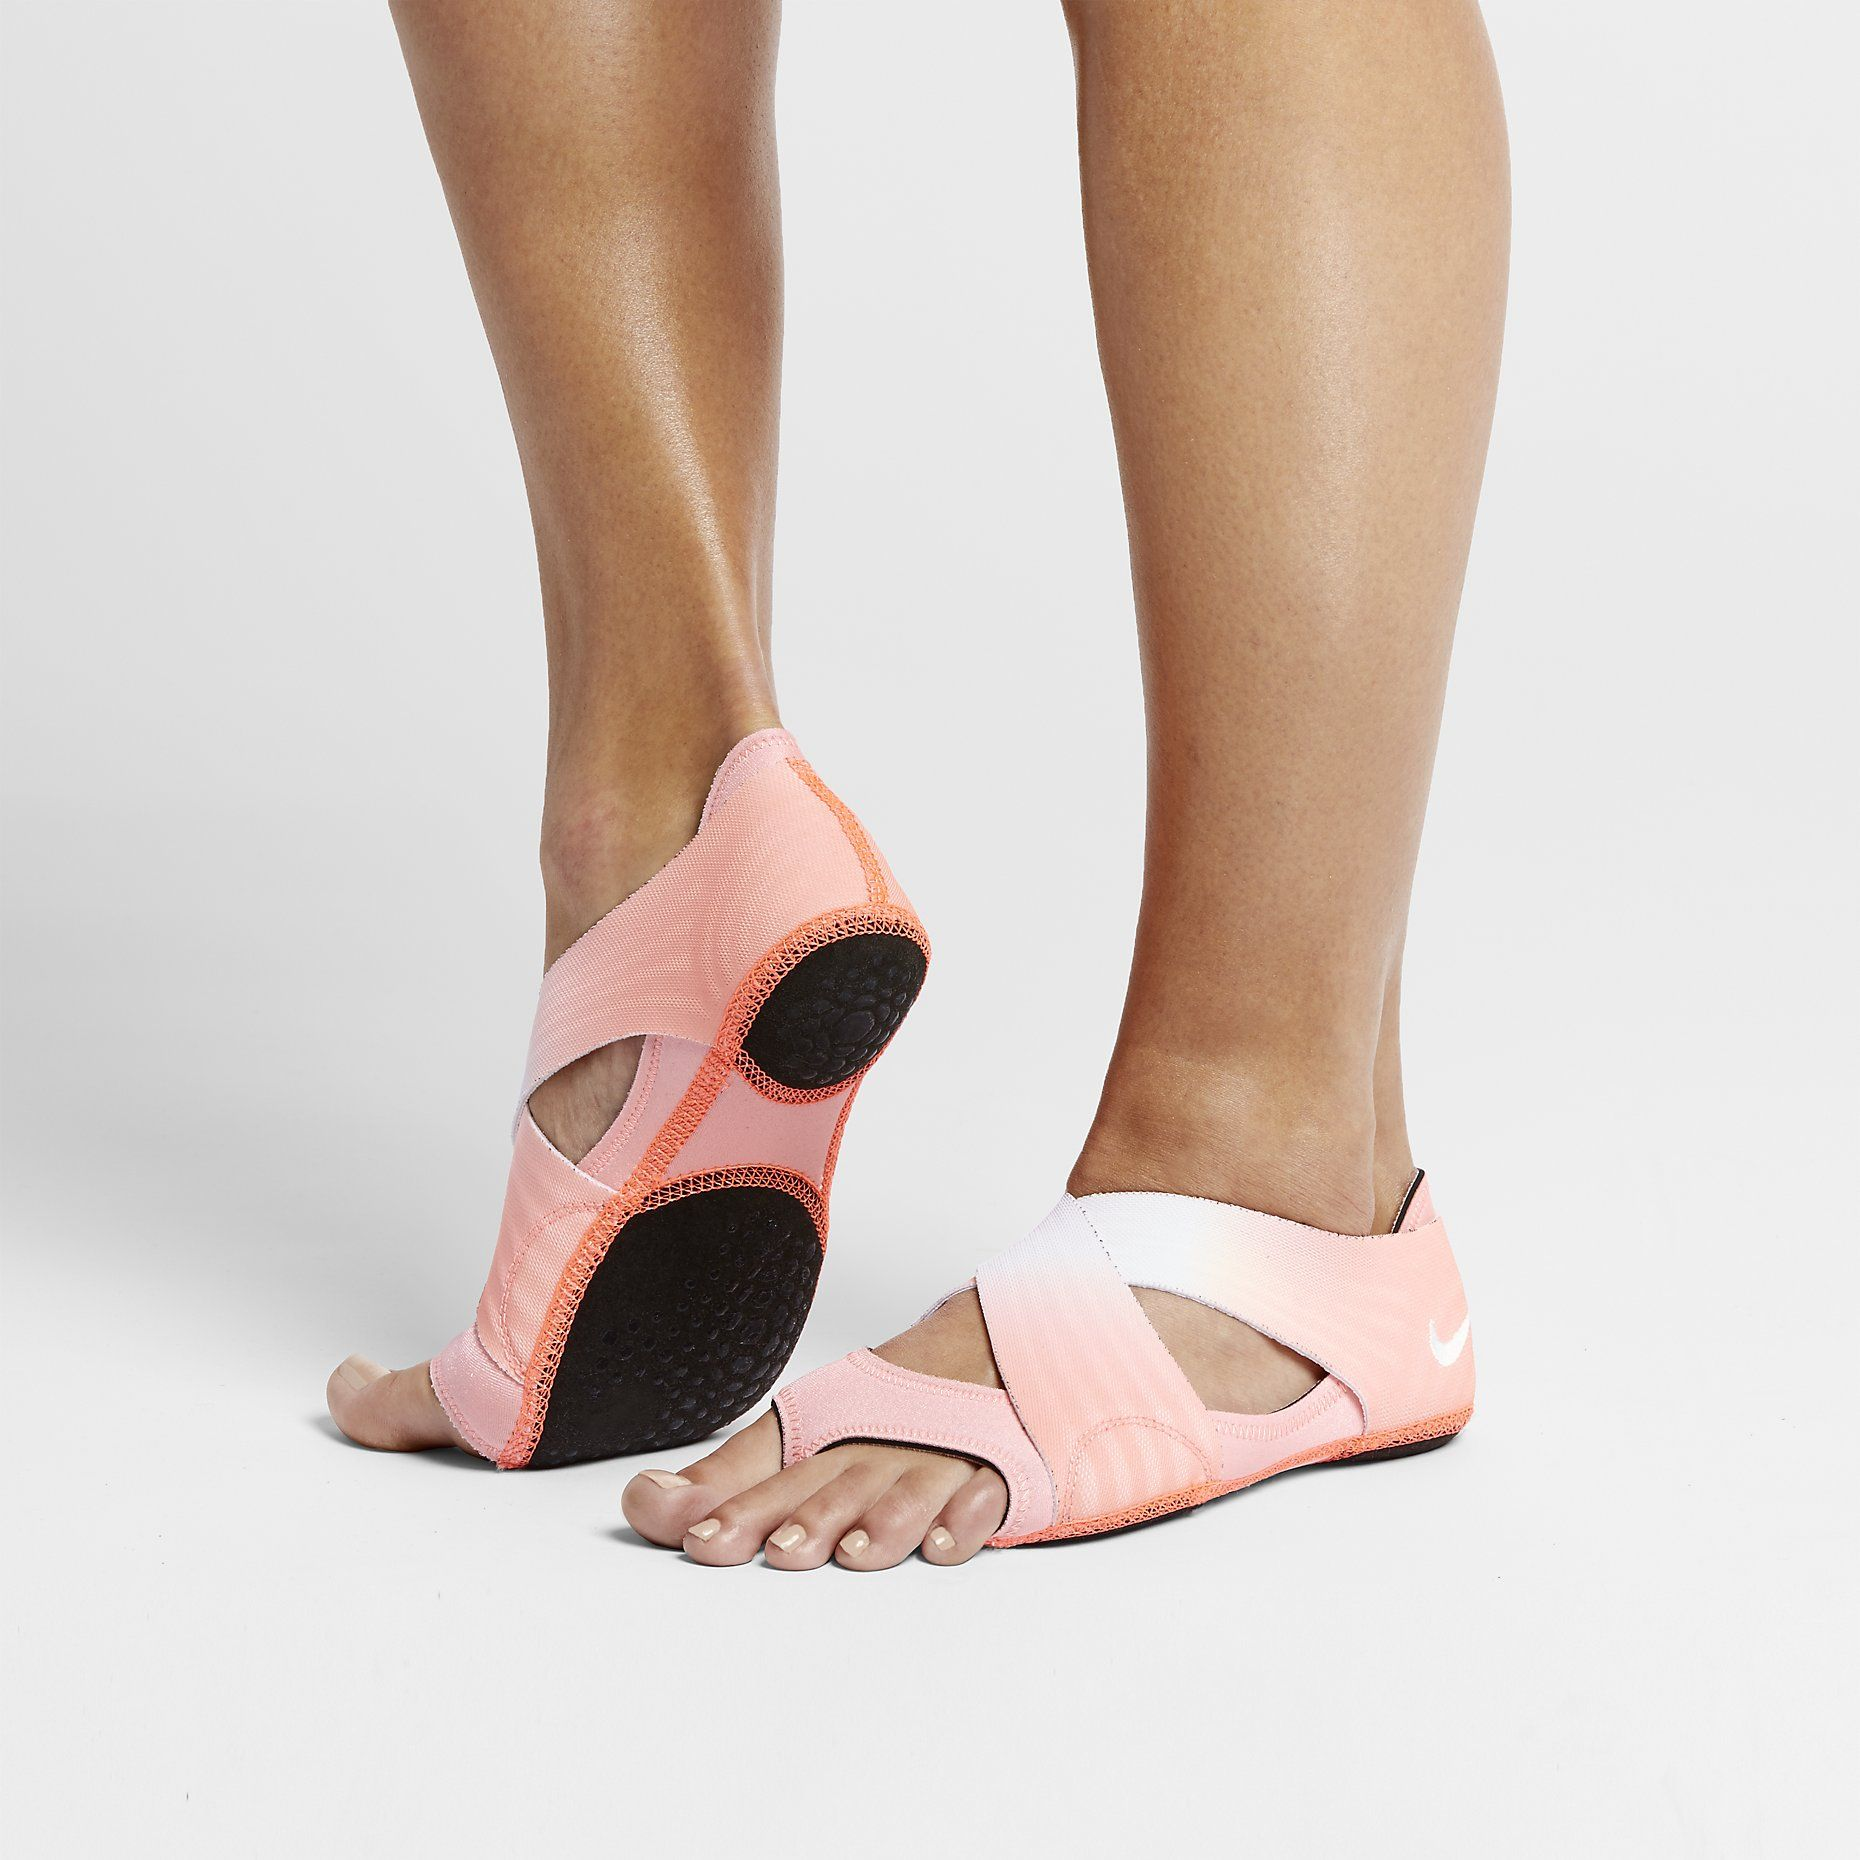 Fitness tools nike studio wraps - Nike Studio Wrap 3 Women S Training Shoe Nike Store